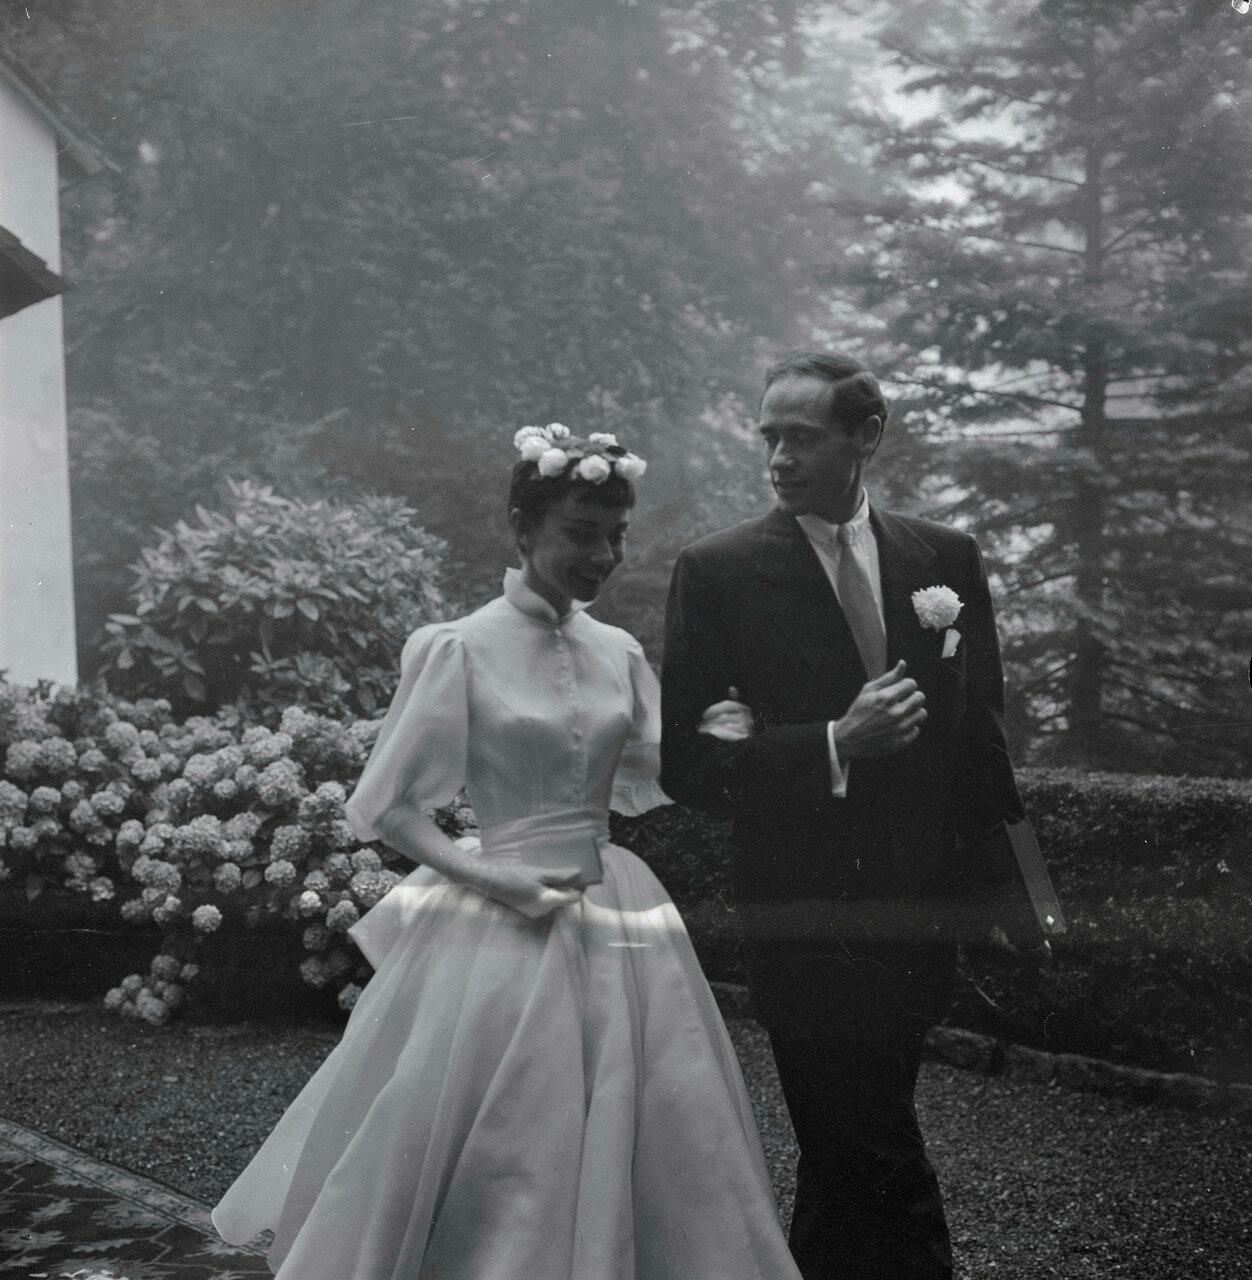 одри хепберн фото свадьба